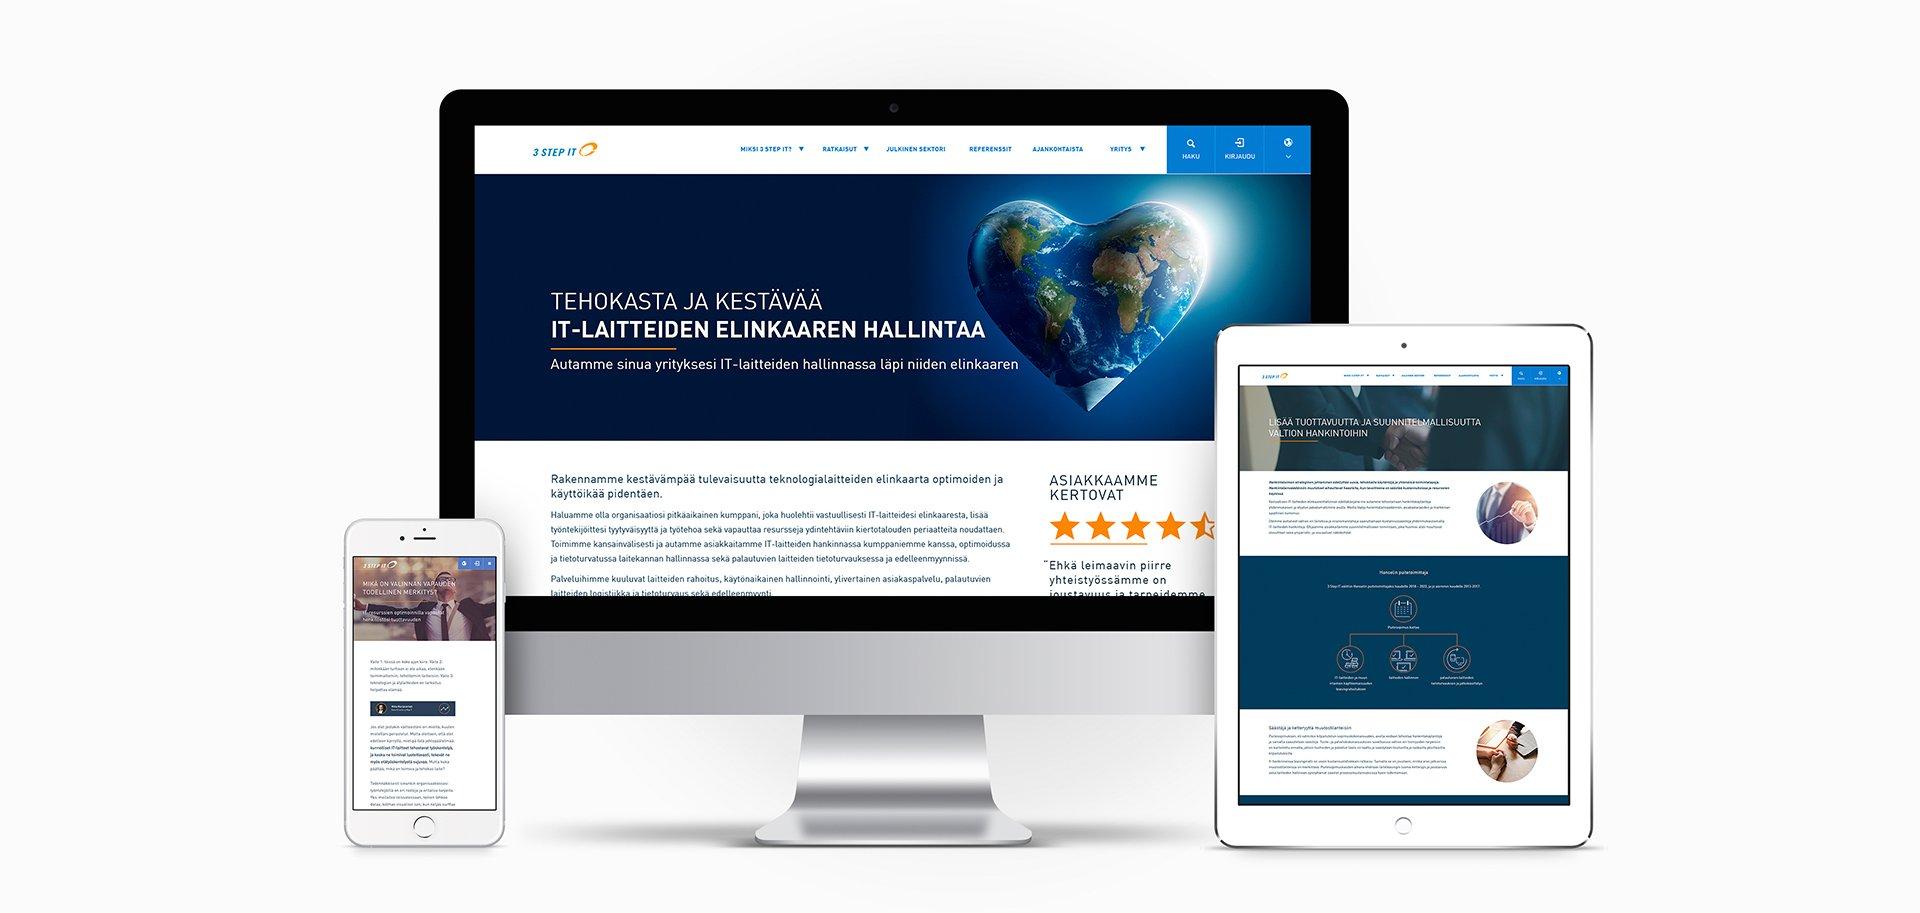 case 3 step it - webpages